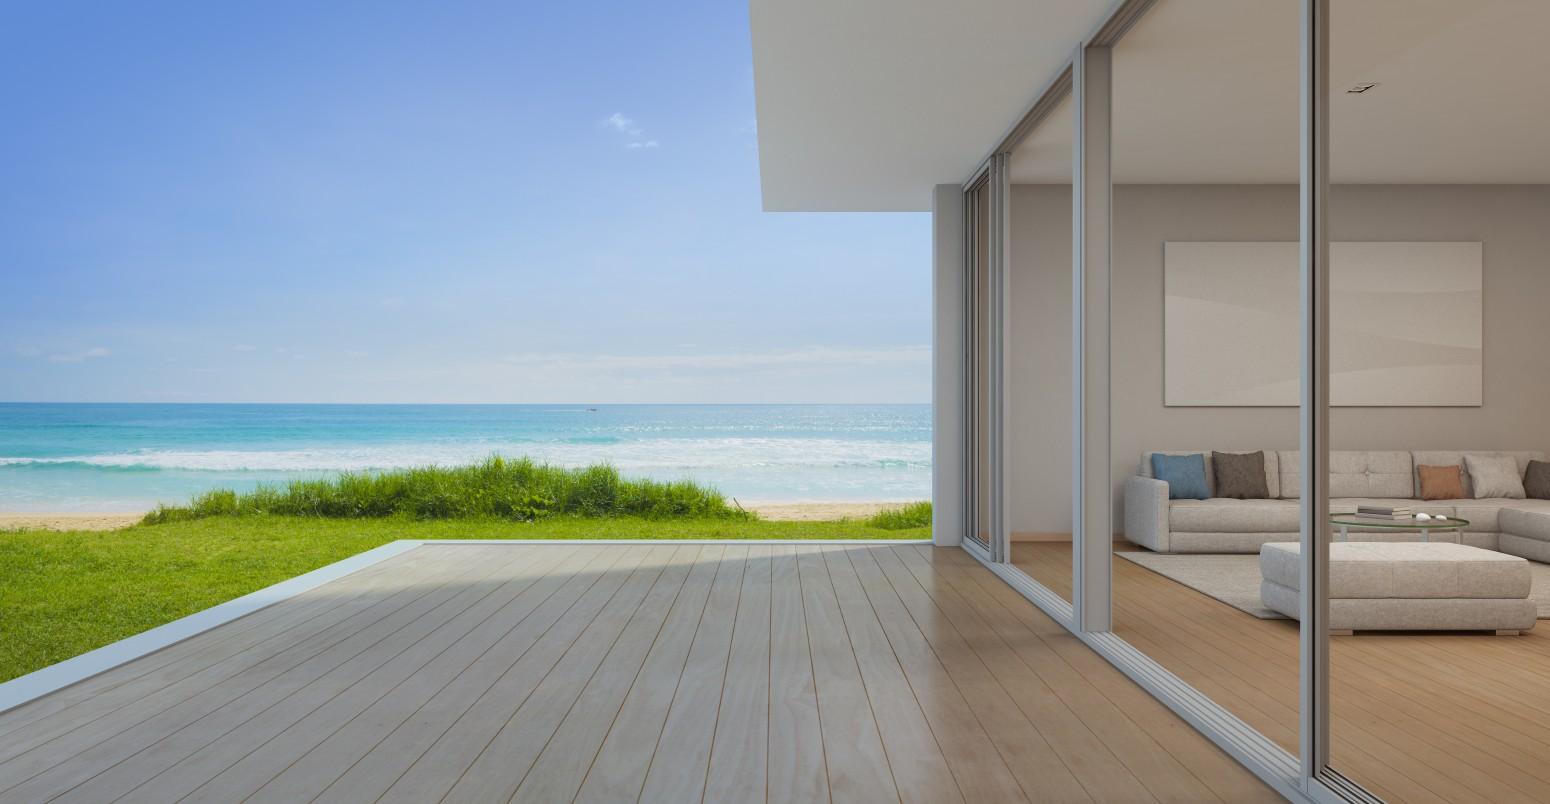 Florida Immobilien - Hauskauf in Florida